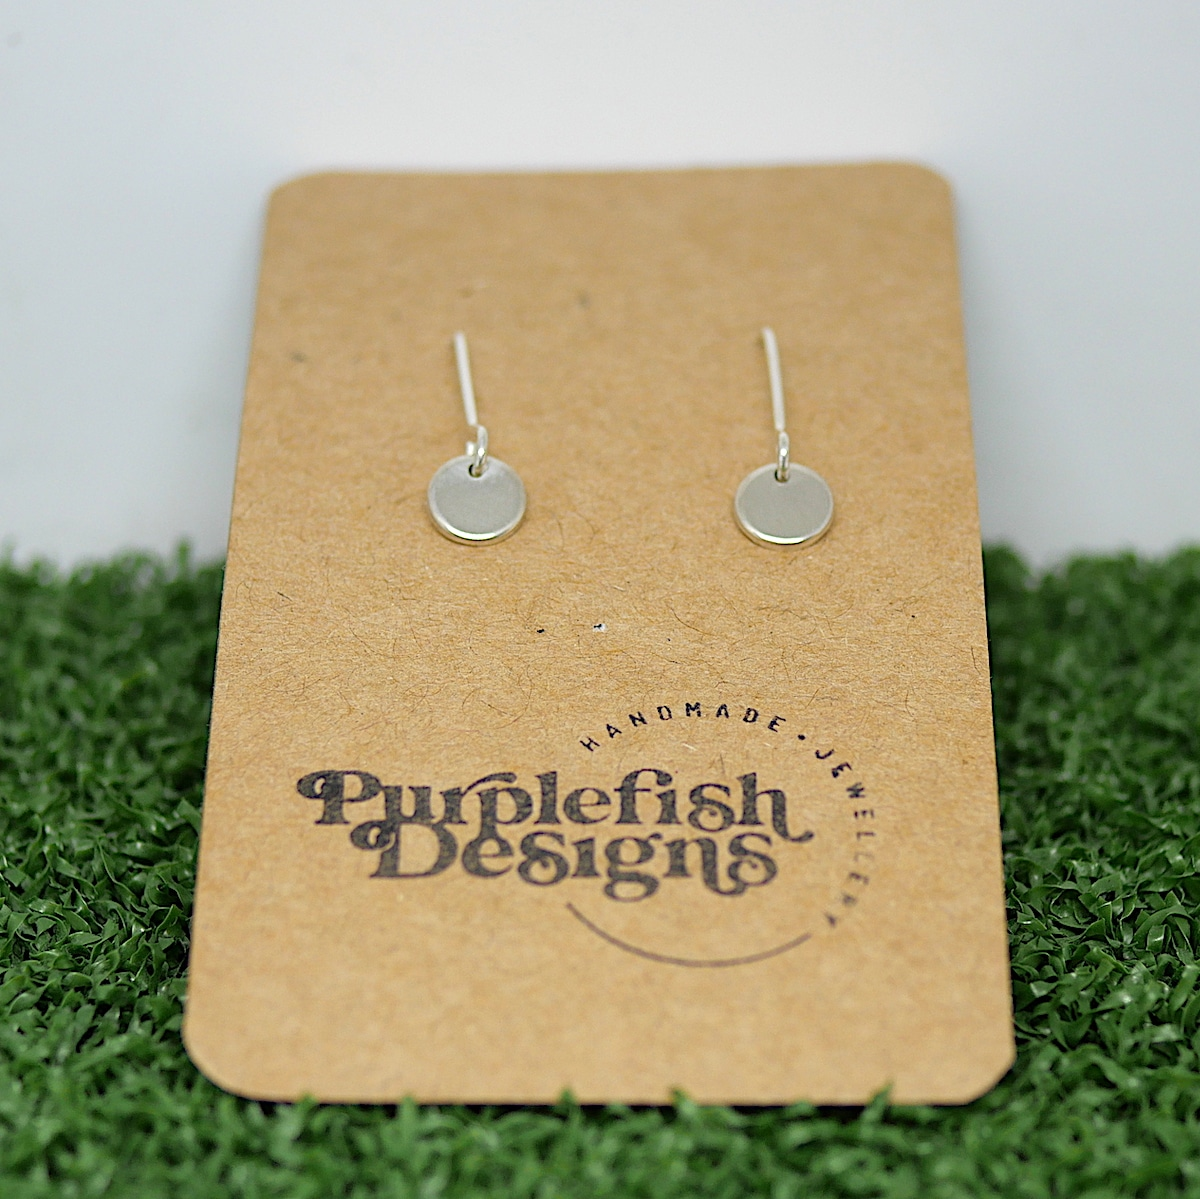 Tiny Dot Earrings – Handmade Sterling Silver Earrings By Purplefish Designs